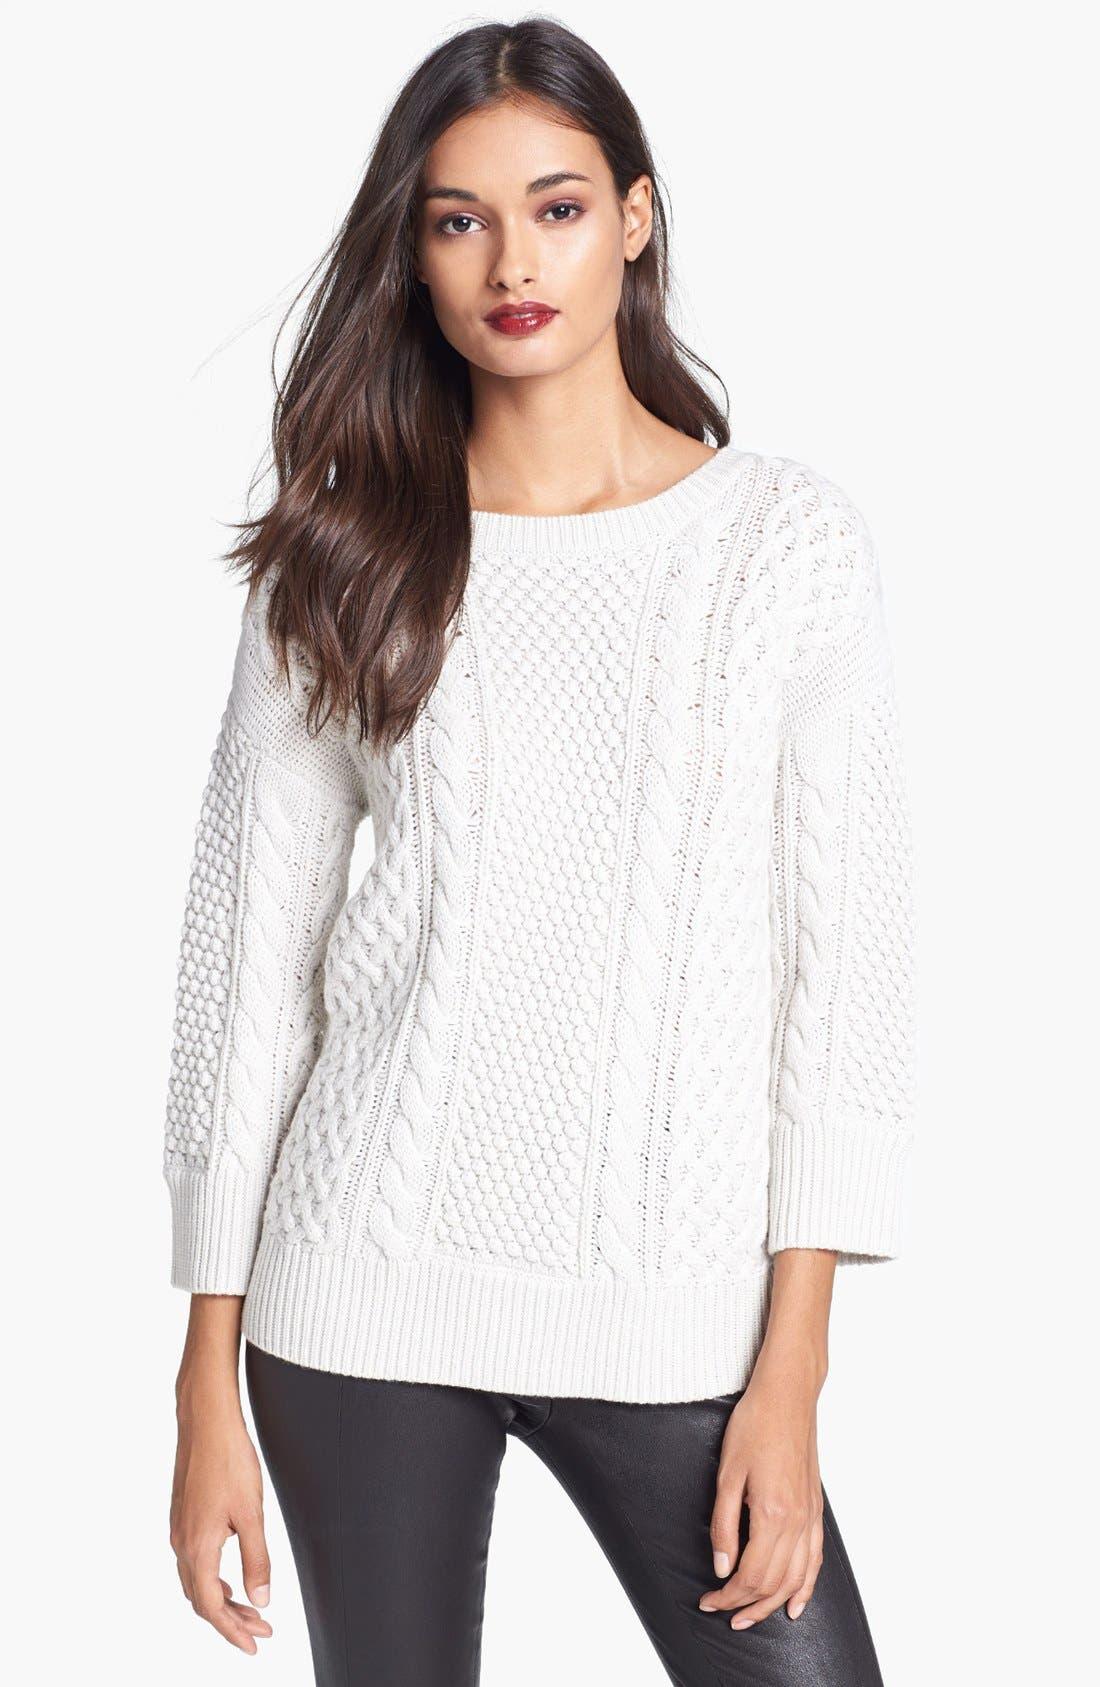 Alternate Image 1 Selected - Trina Turk 'Haya' Merino Wool Sweater